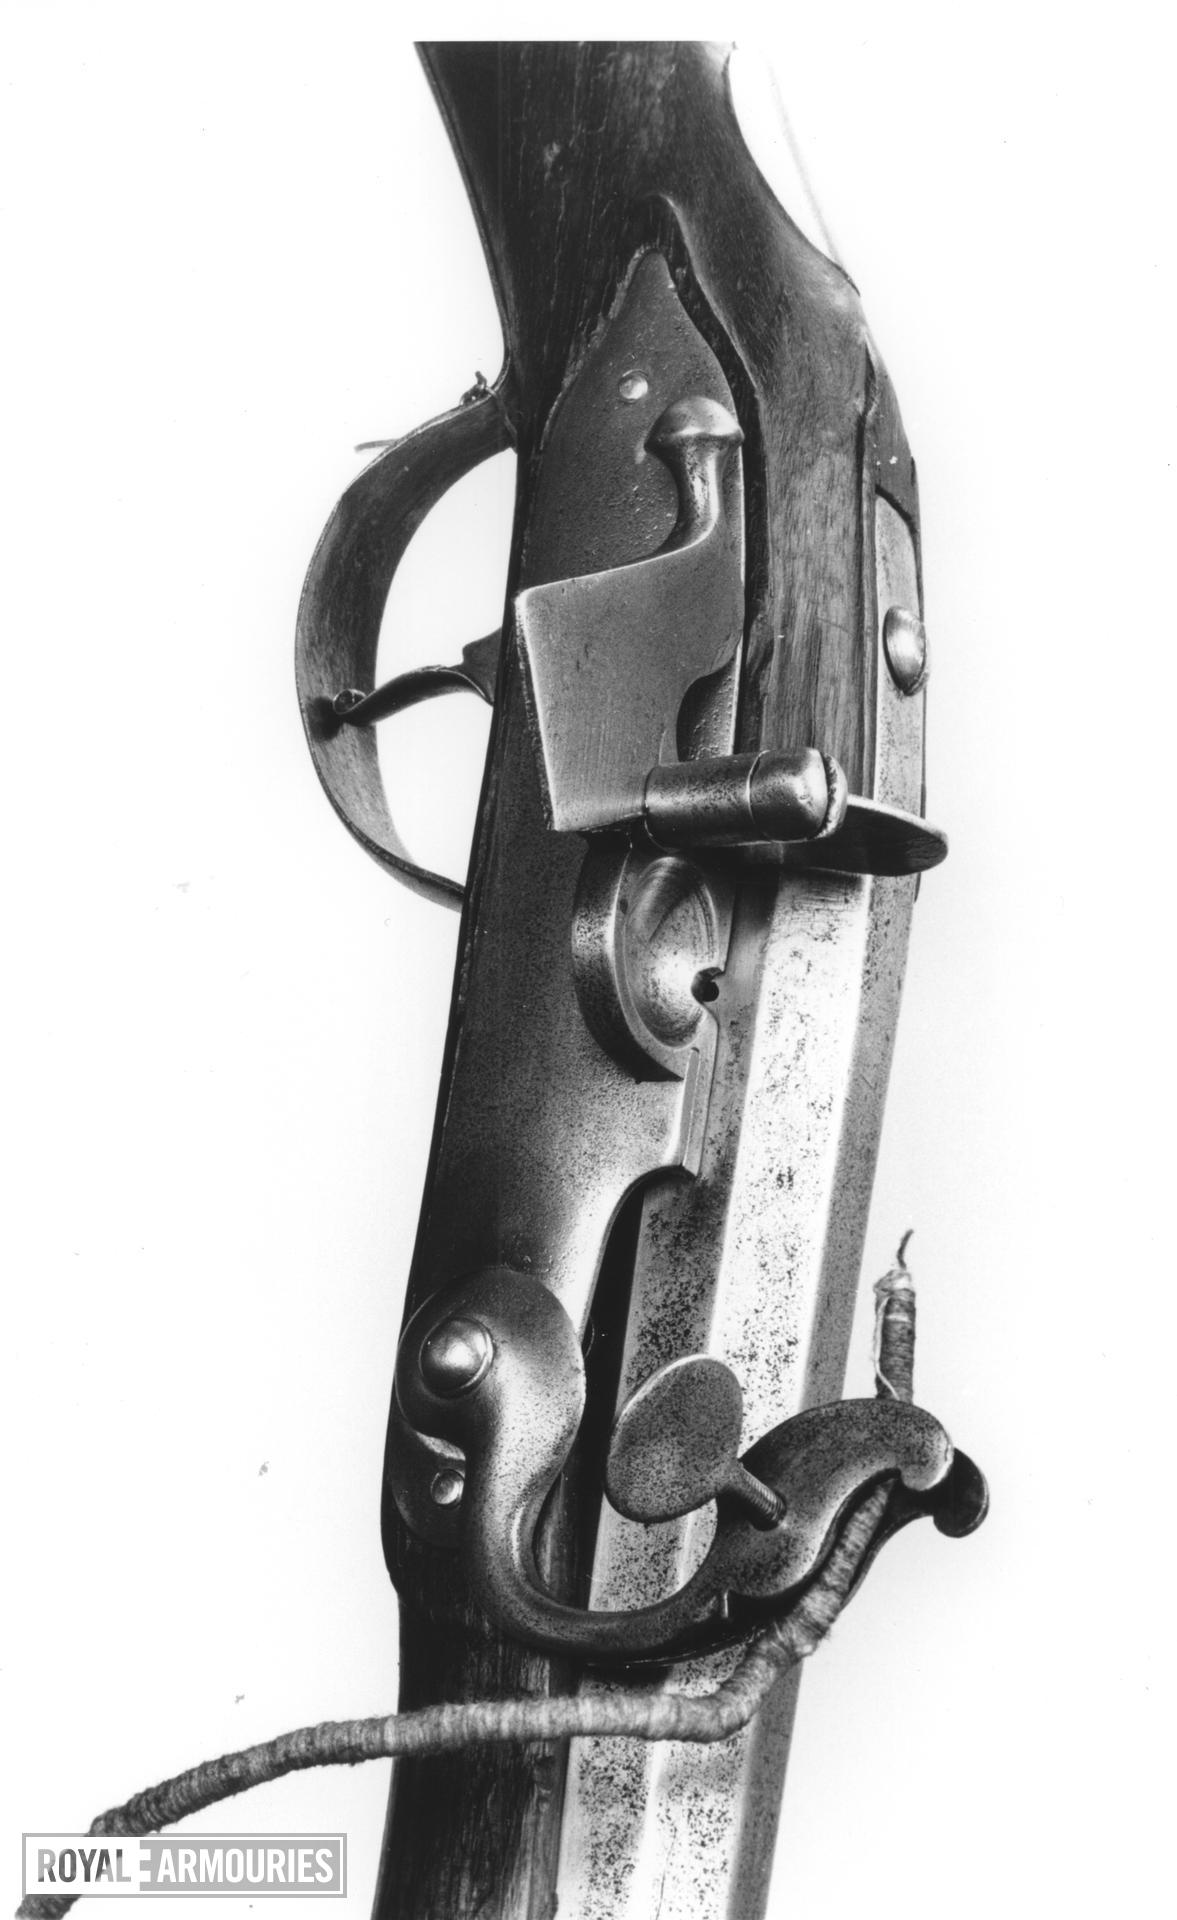 Matchlock muzzle-loading musket - William III Pattern Service type.